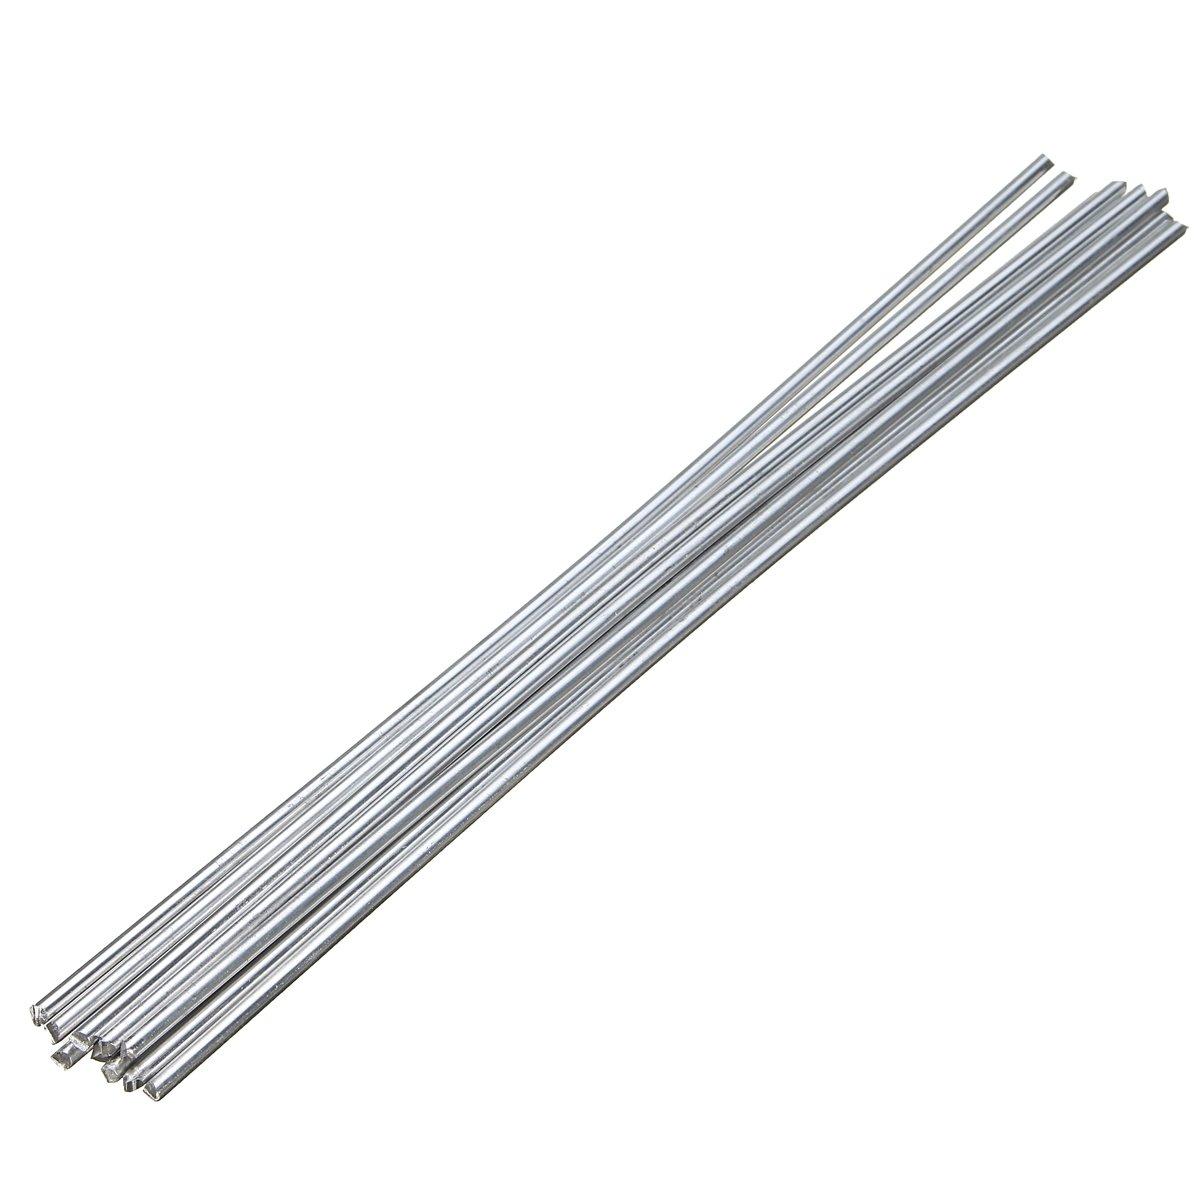 KUNSE 10Pcs Low Temperature Alumaloy Aluminum Repair Rods 3.2Mmx230Mm Welding Machine Accessories